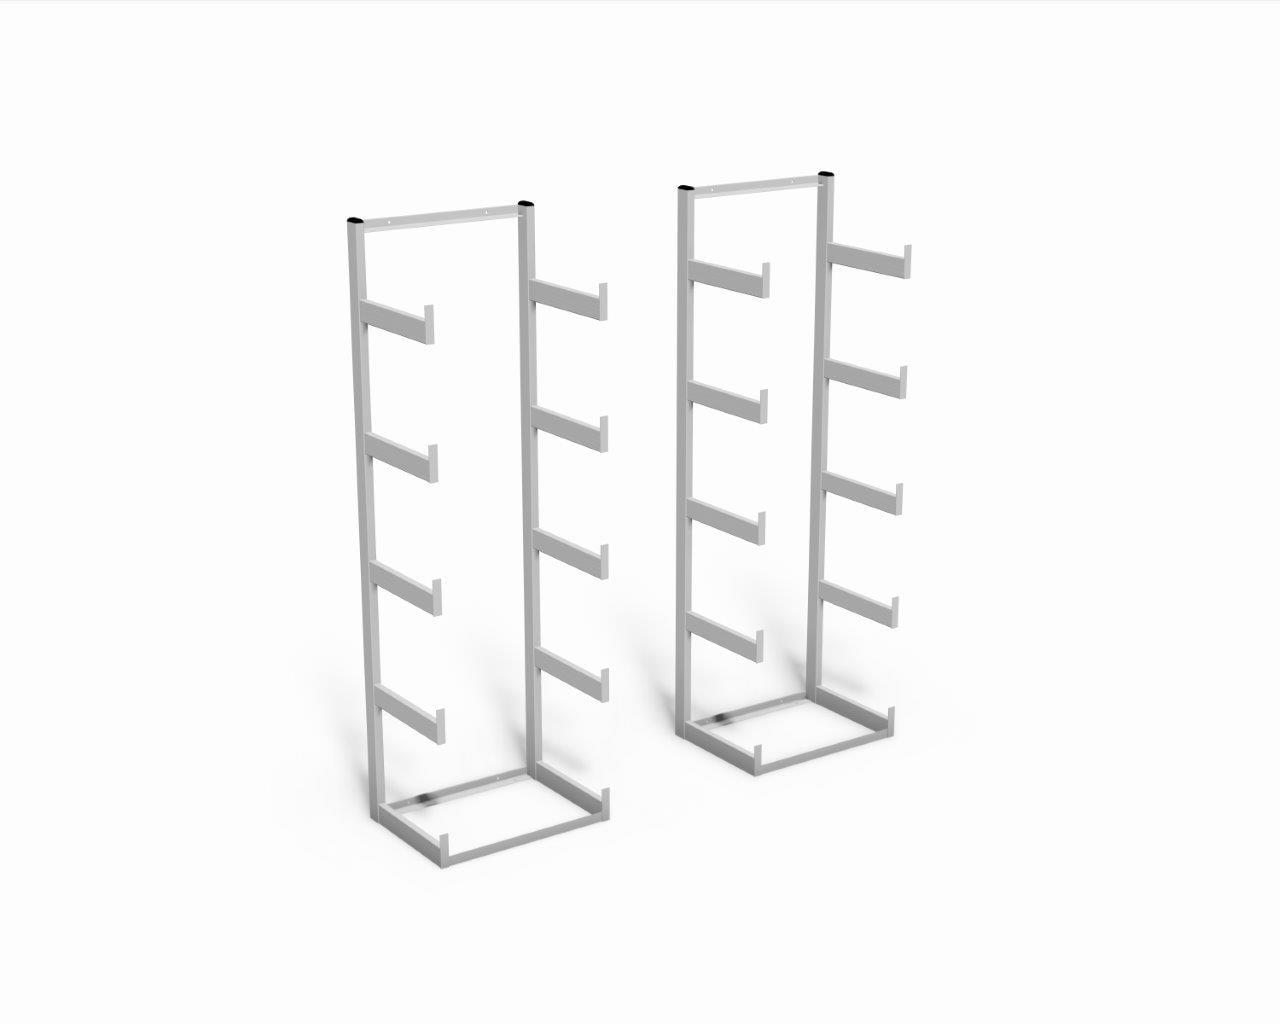 Horizontal Storage Rack  sc 1 st  Nortek Group & Horizontal Storage Rack | Nortek Group